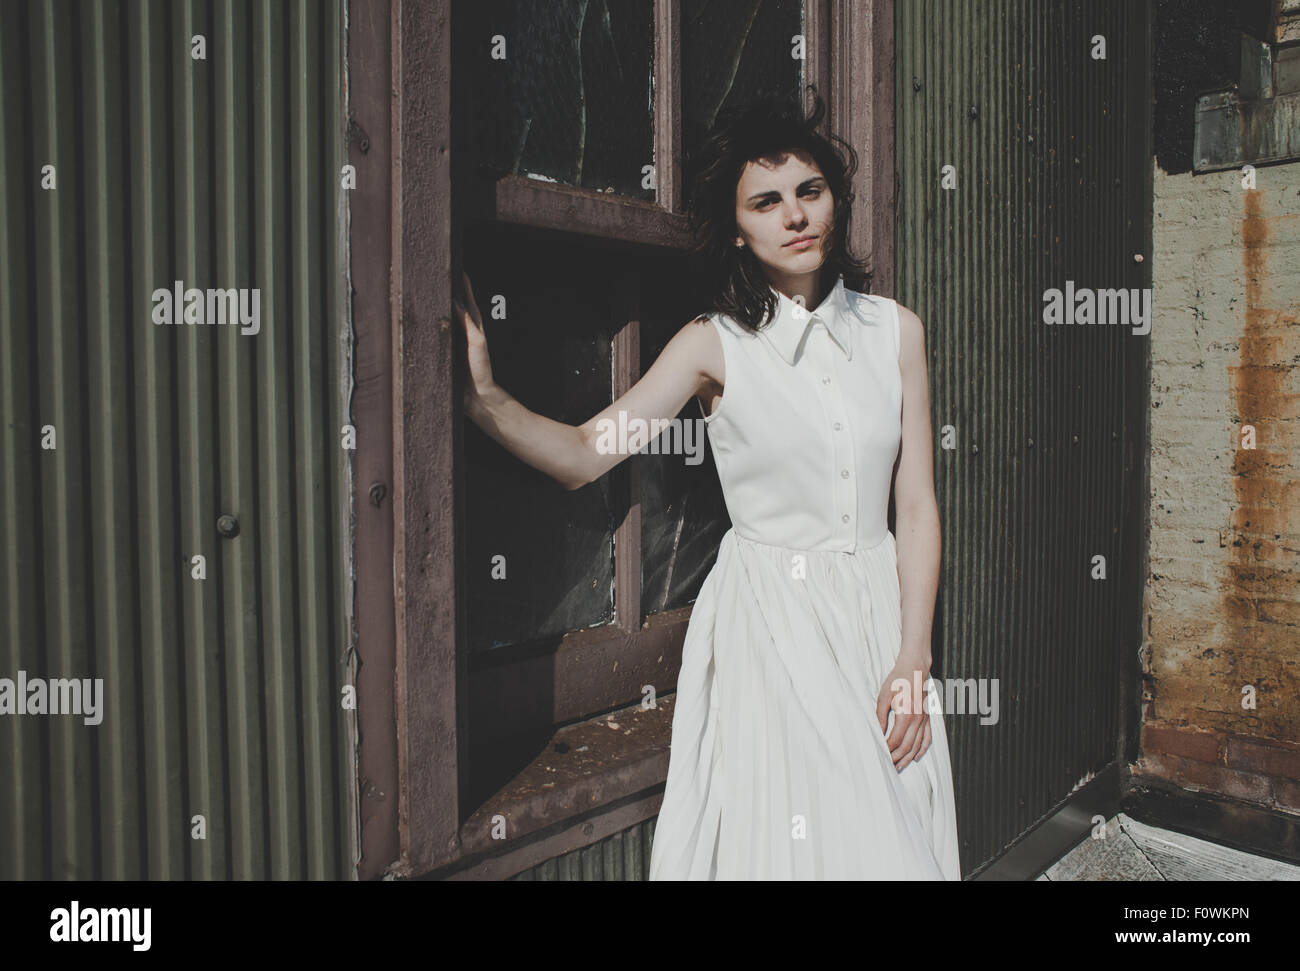 /Albertine/ Stockbild